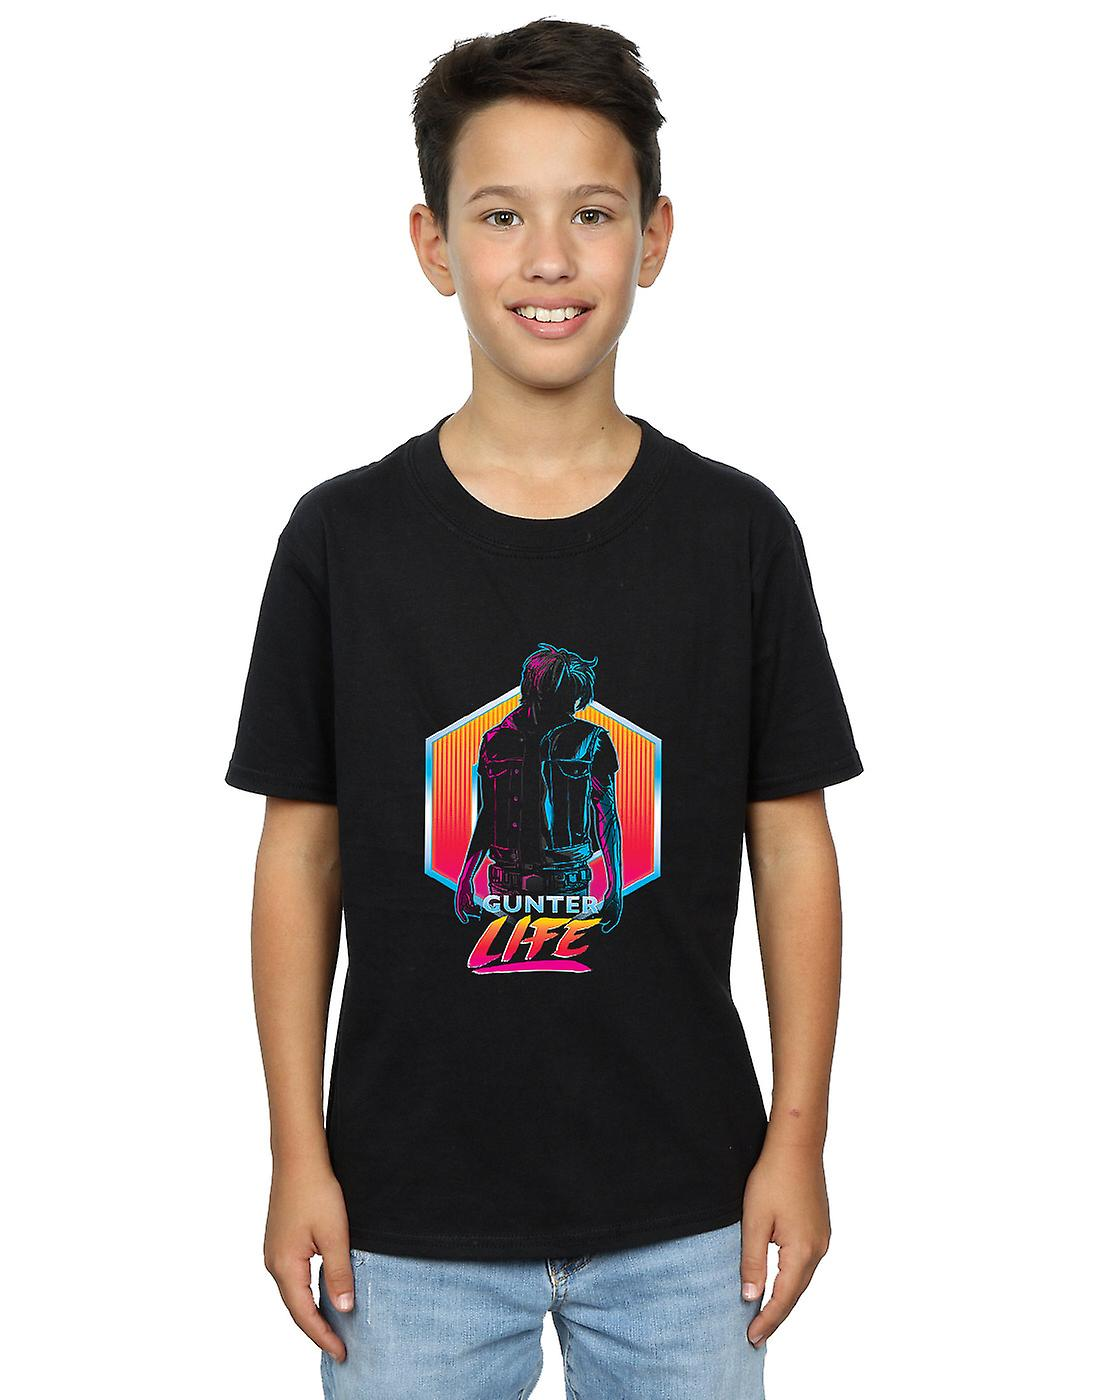 Ready Player One Boys Gunter Life T-Shirt